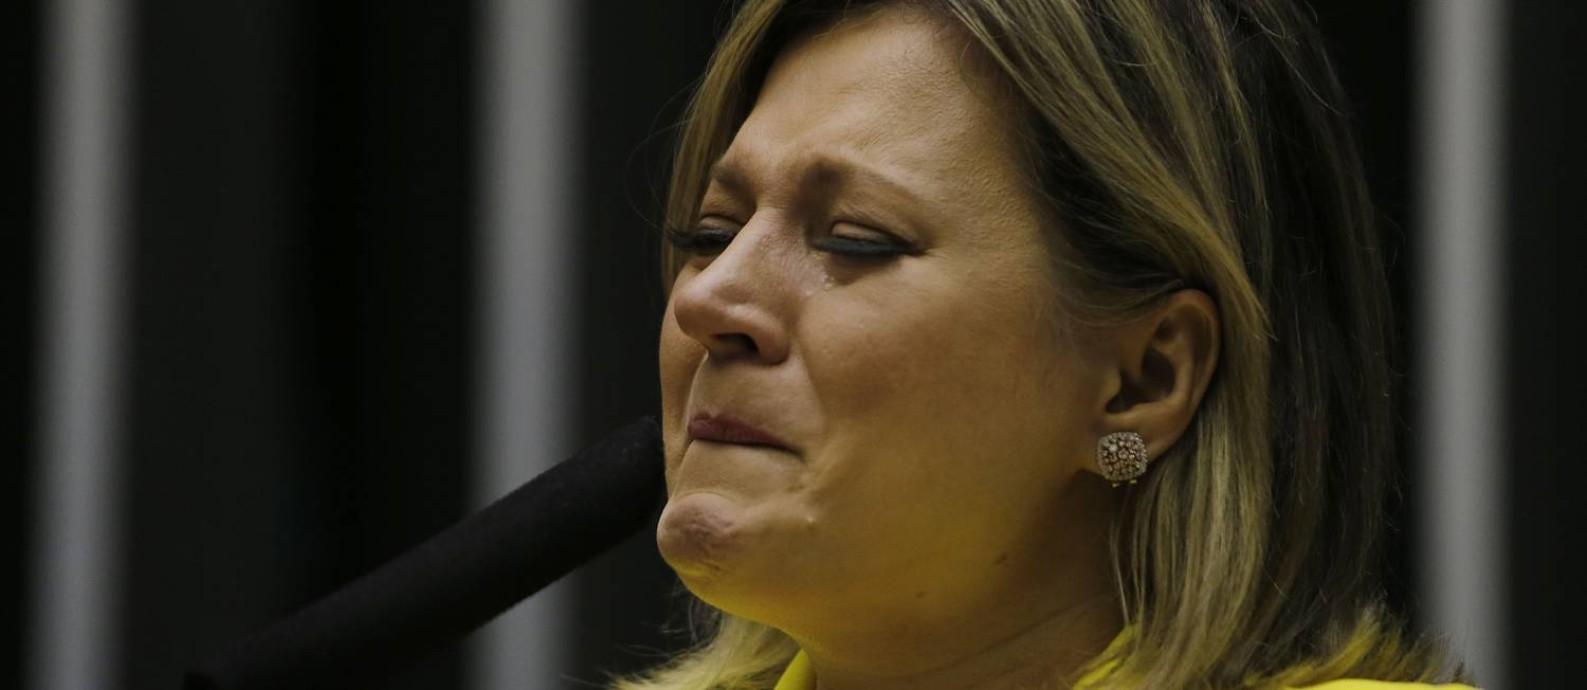 Joice Hasselmann Chora Ao Relatar Xingamentos E Reacao De Filhos A Ameacas Jornal O Globo